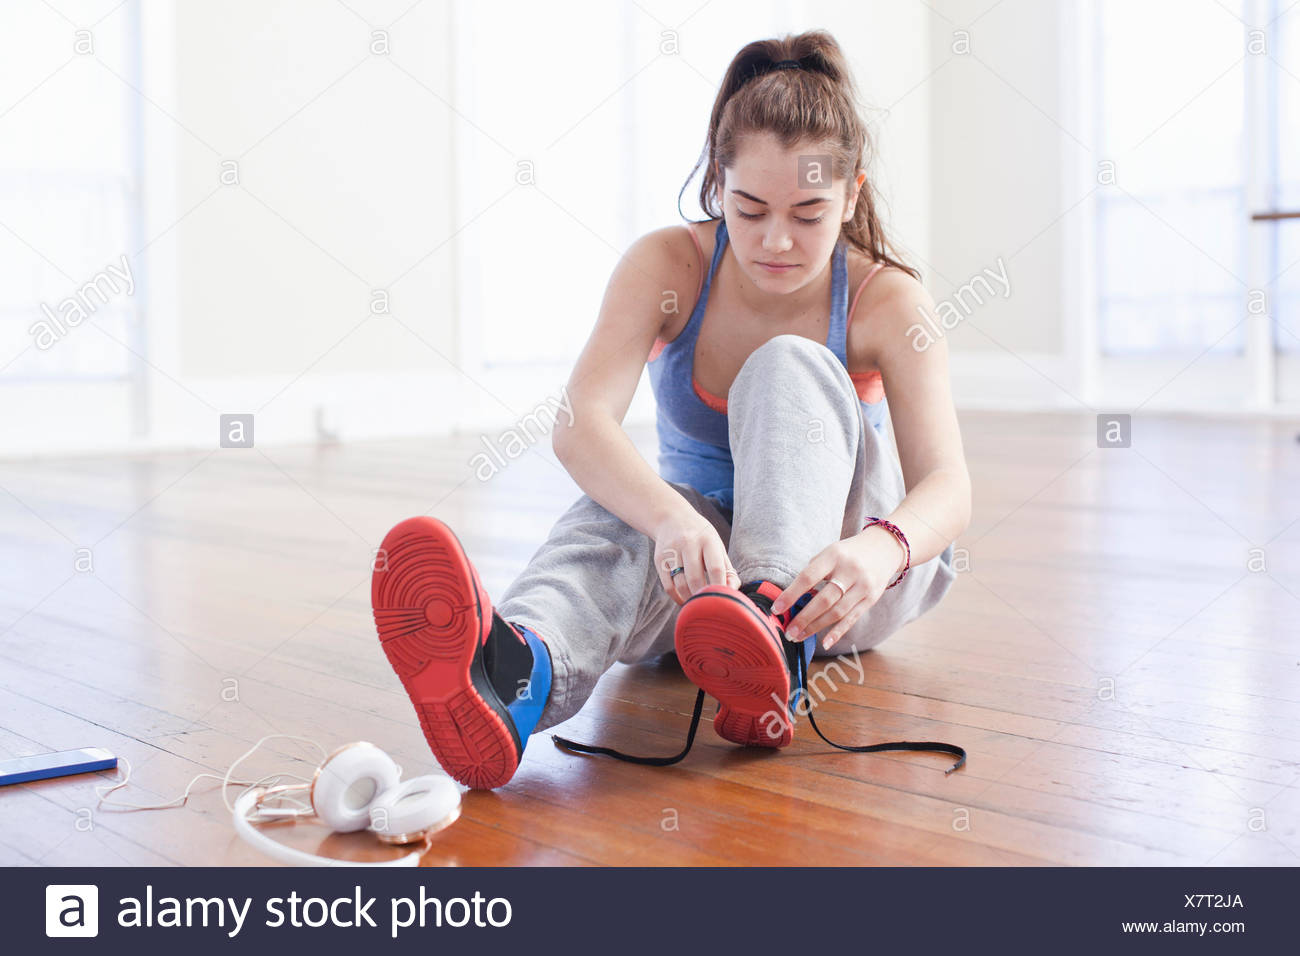 Teenage girl tying trainer laces in ballet school - Stock Image